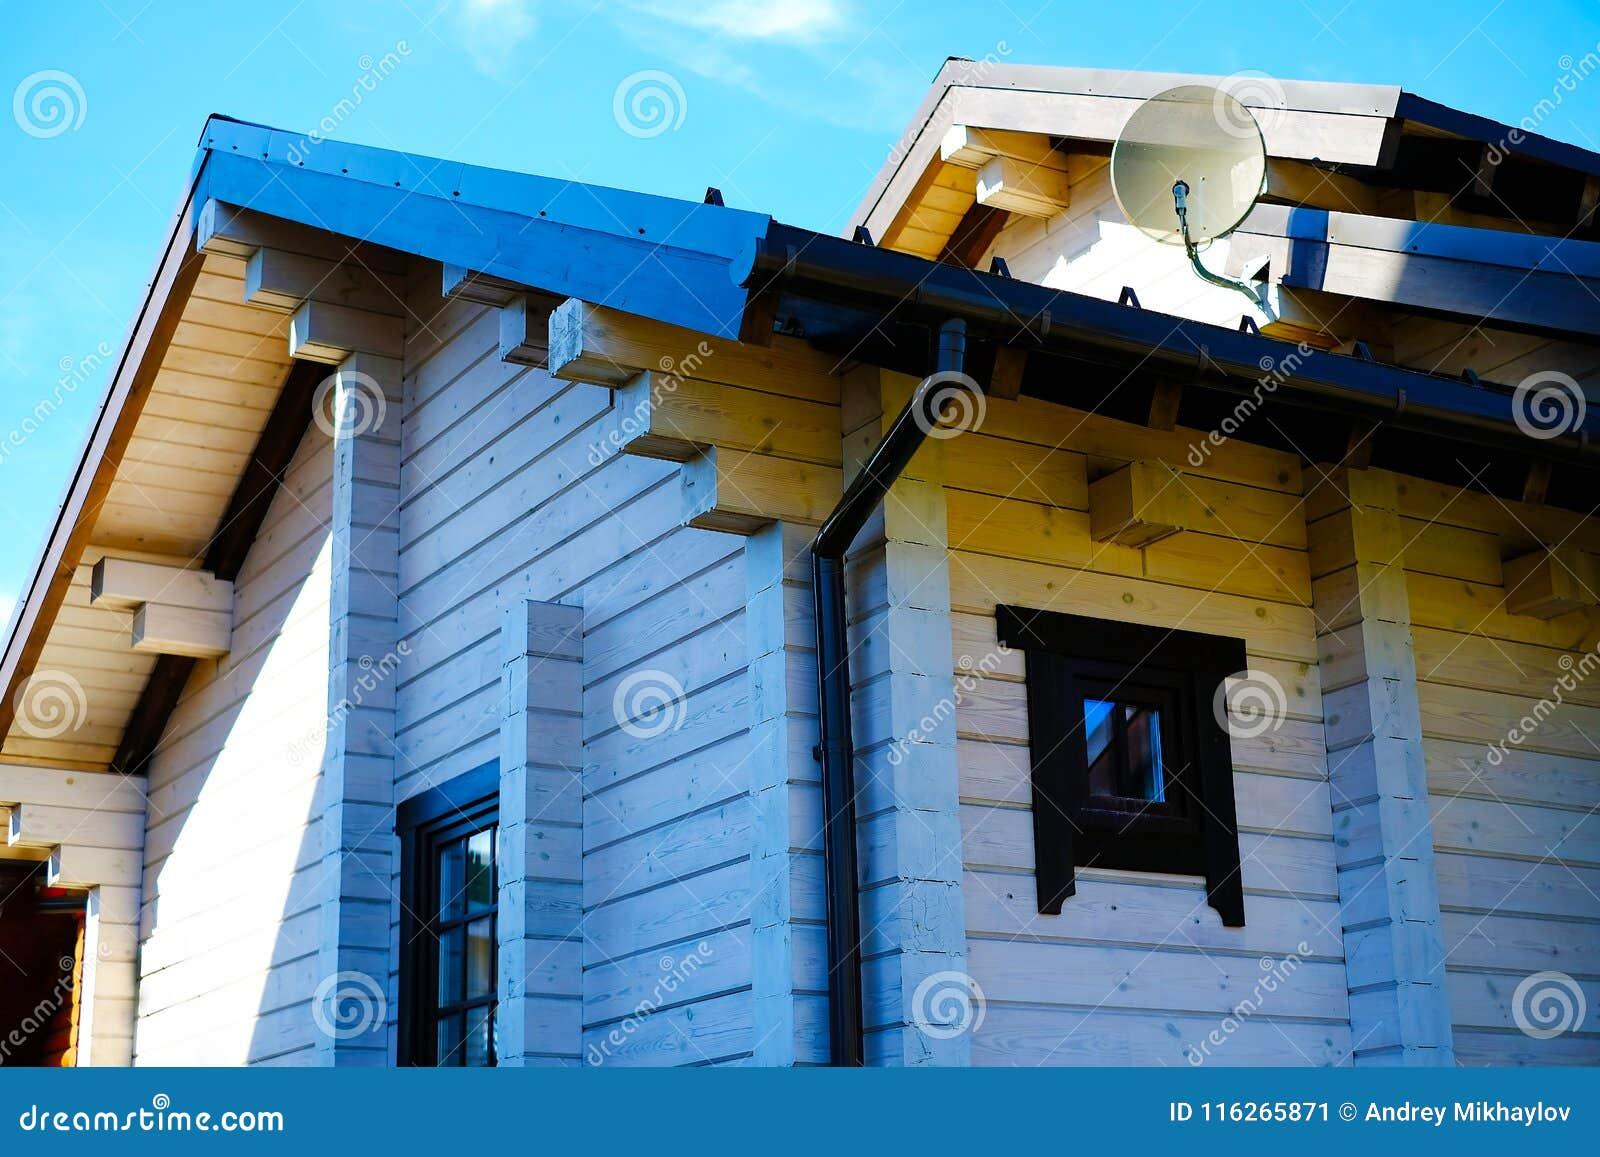 Härlig journalkabin på en kulle med Windows